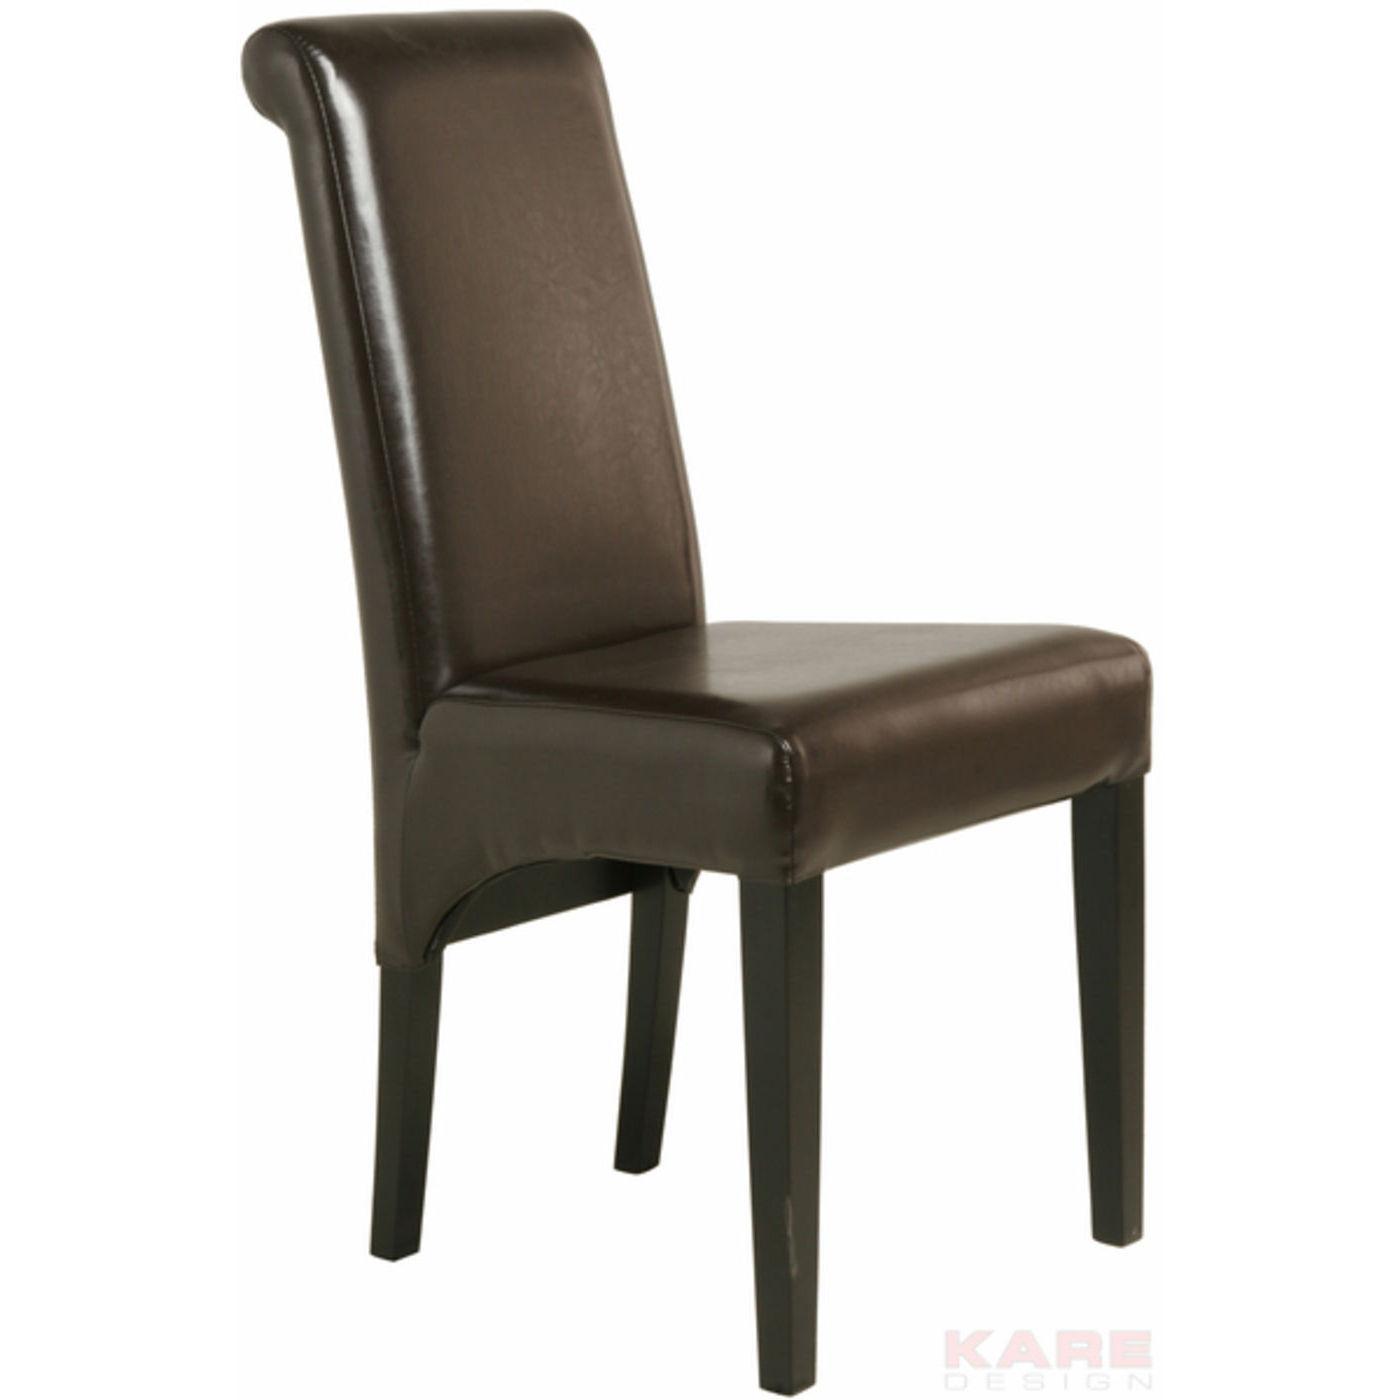 Stuhl polsterstuhl esszimmerstuhl lederlook braun neu kare for Stuhl design ebay